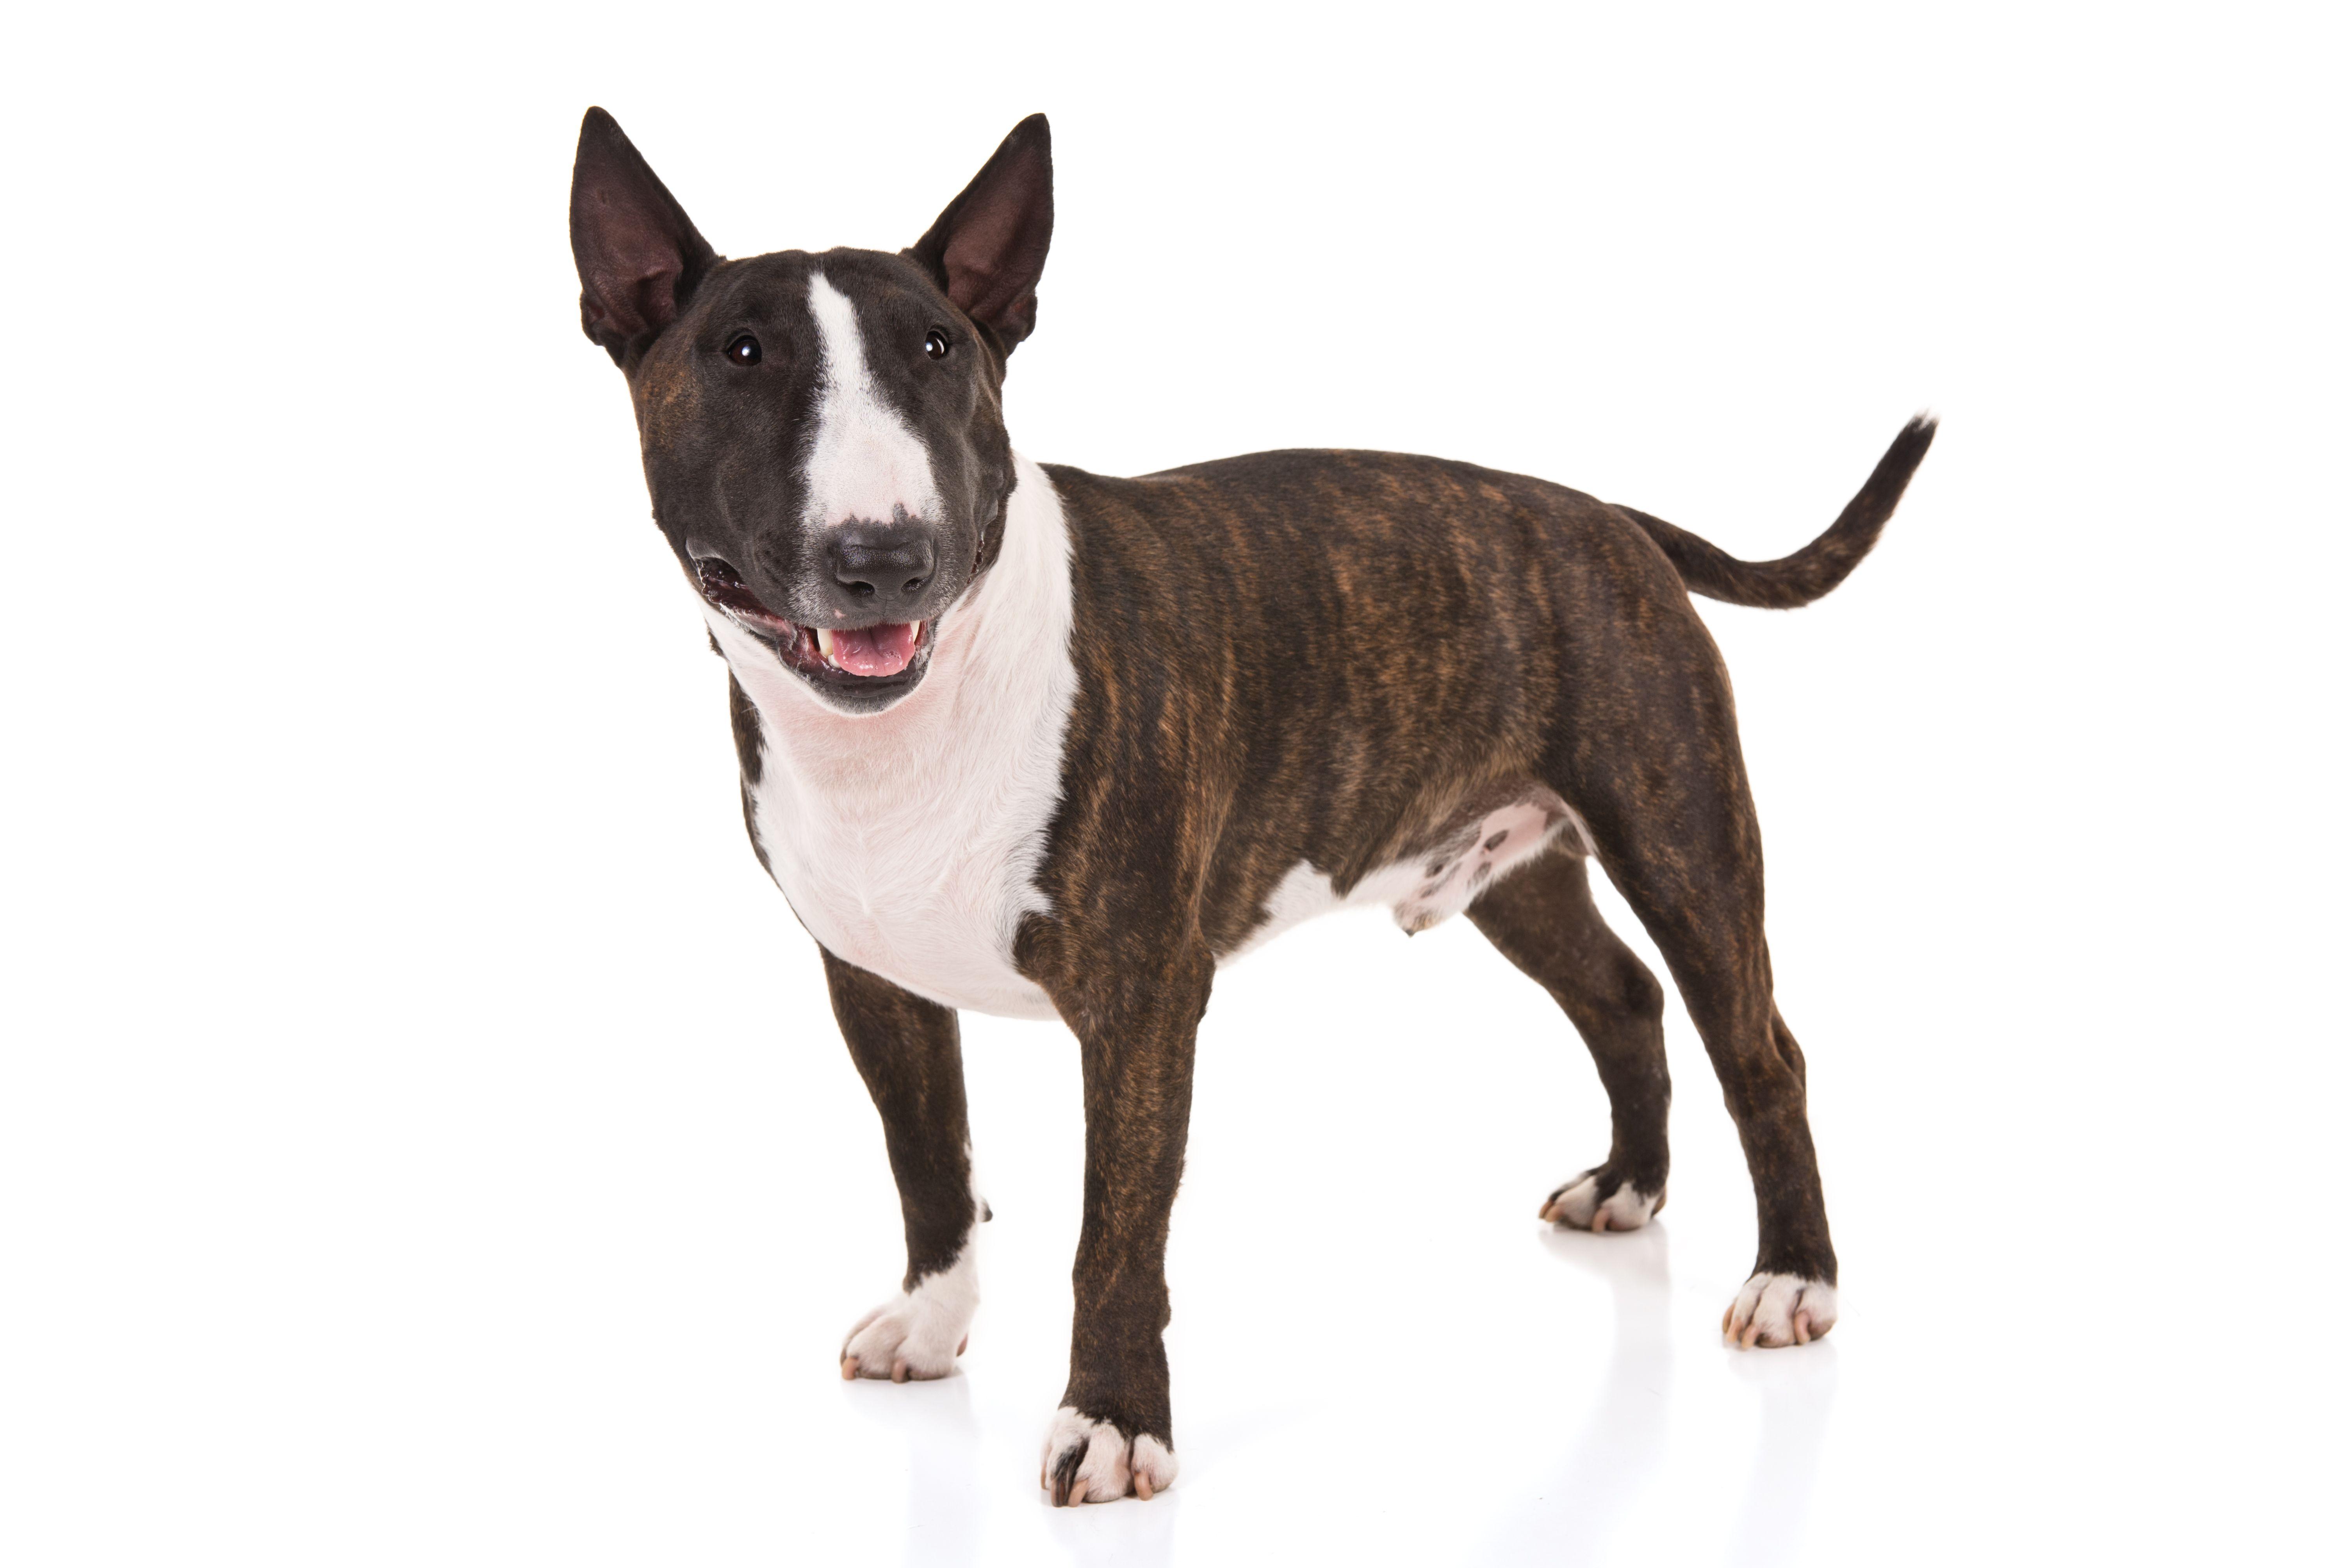 Miniature Bull Terrier Dog Breed Information Miniature Bull Terrier Dog Breeds Akc Dog Breeds